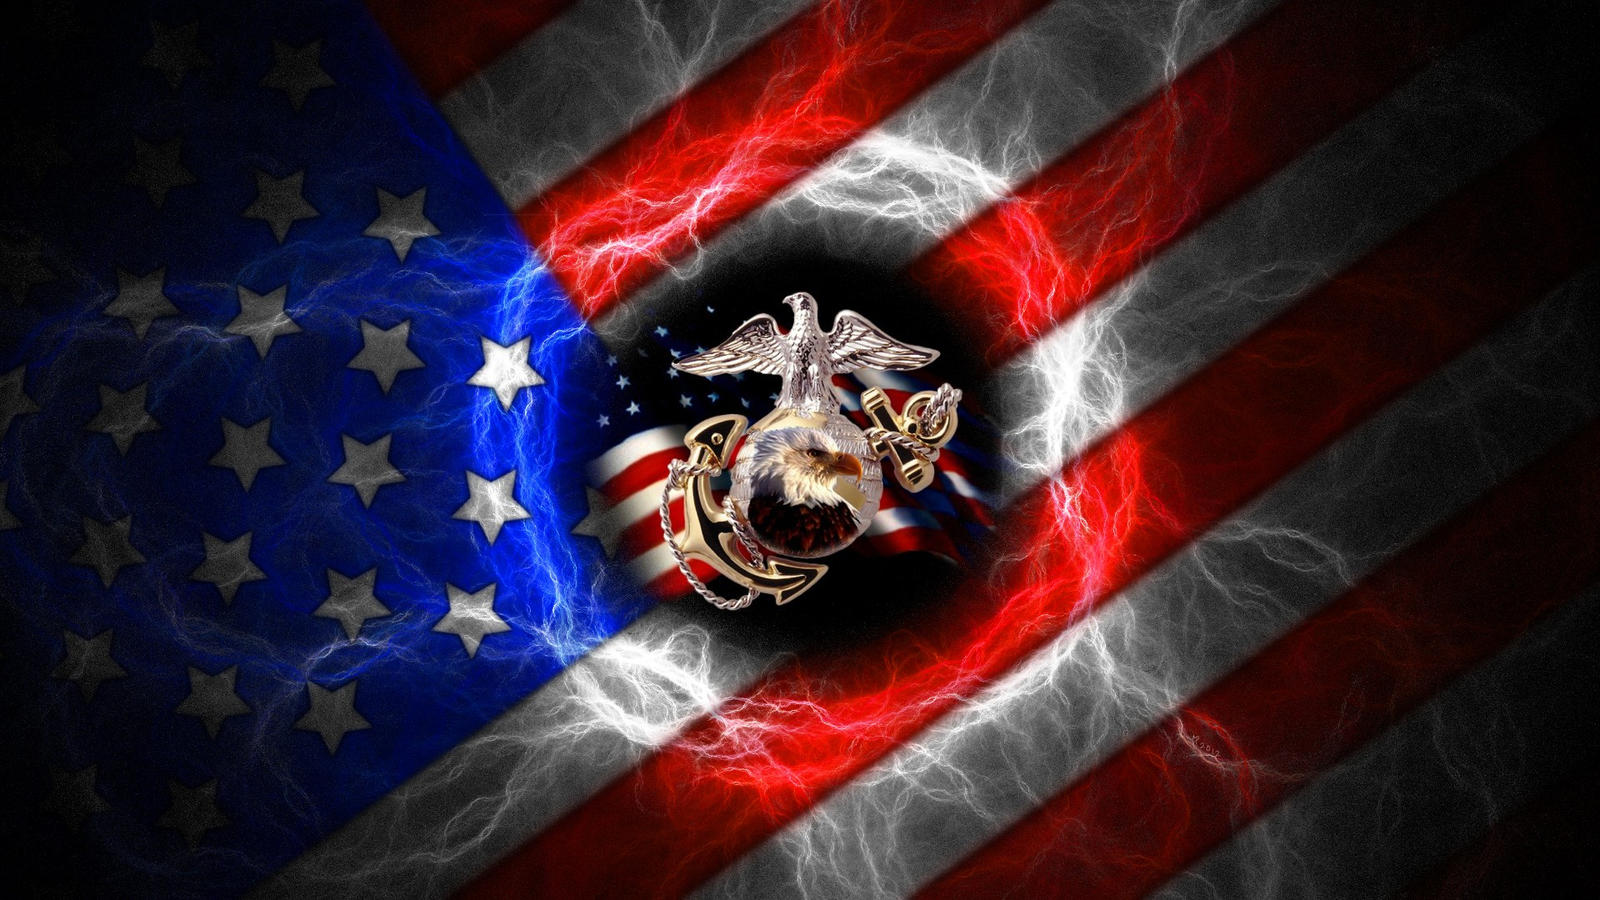 usmc veterans day by praetoriuslexicus digital art fractal art 2007 ...